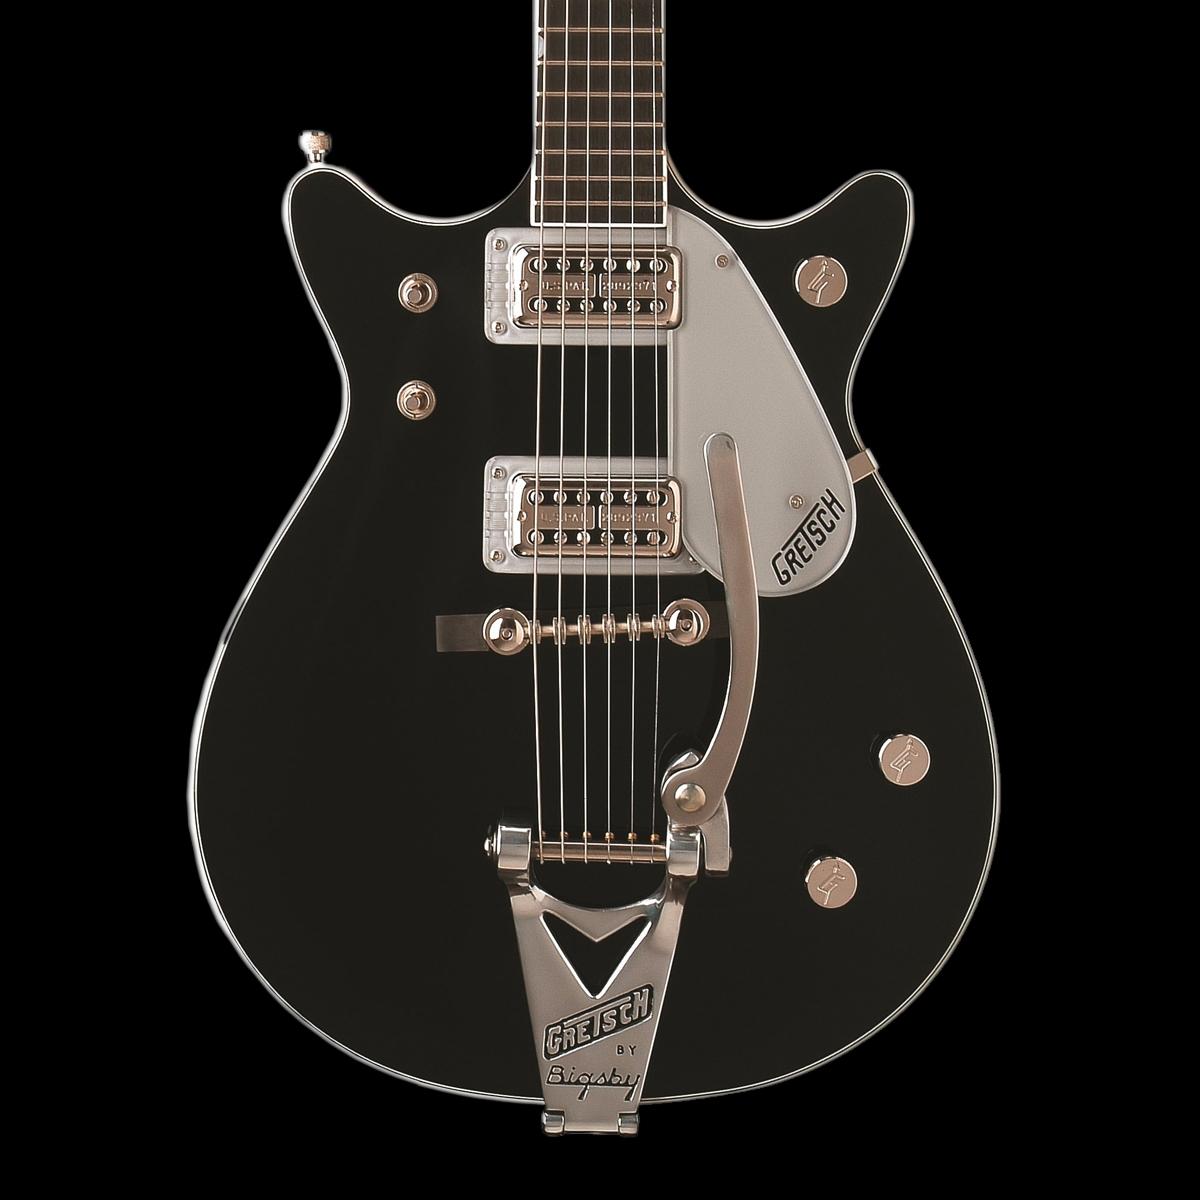 039750f6ee Gretsch G6128T-1962 Duo Jet™ Electric Guitar Black